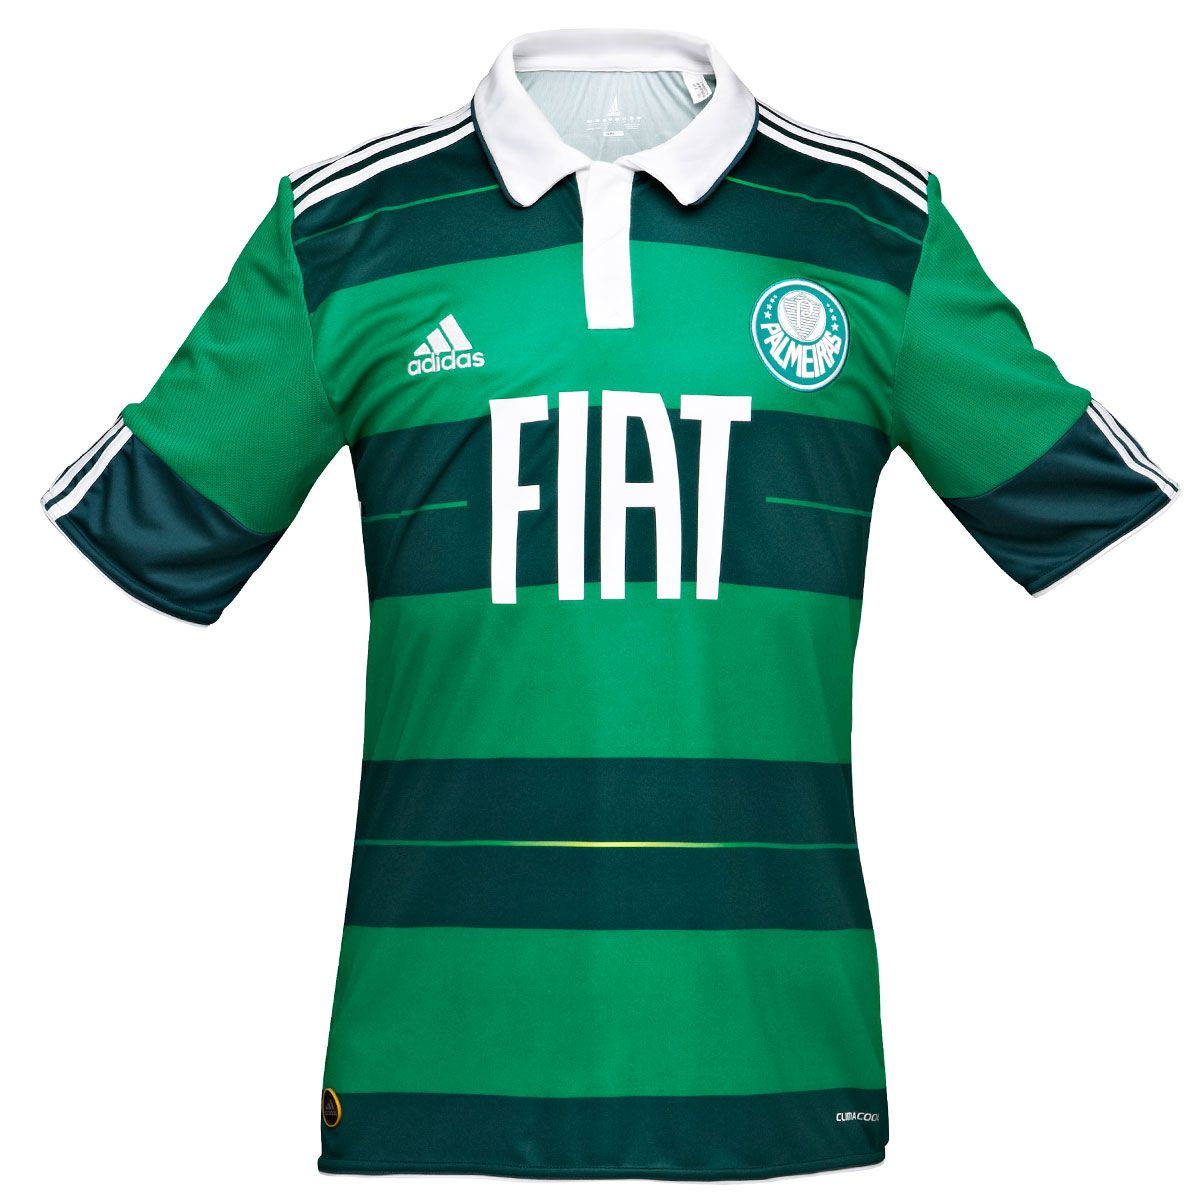 Chùm ảnh: Vasco da Gama(RJ) jersey (34)